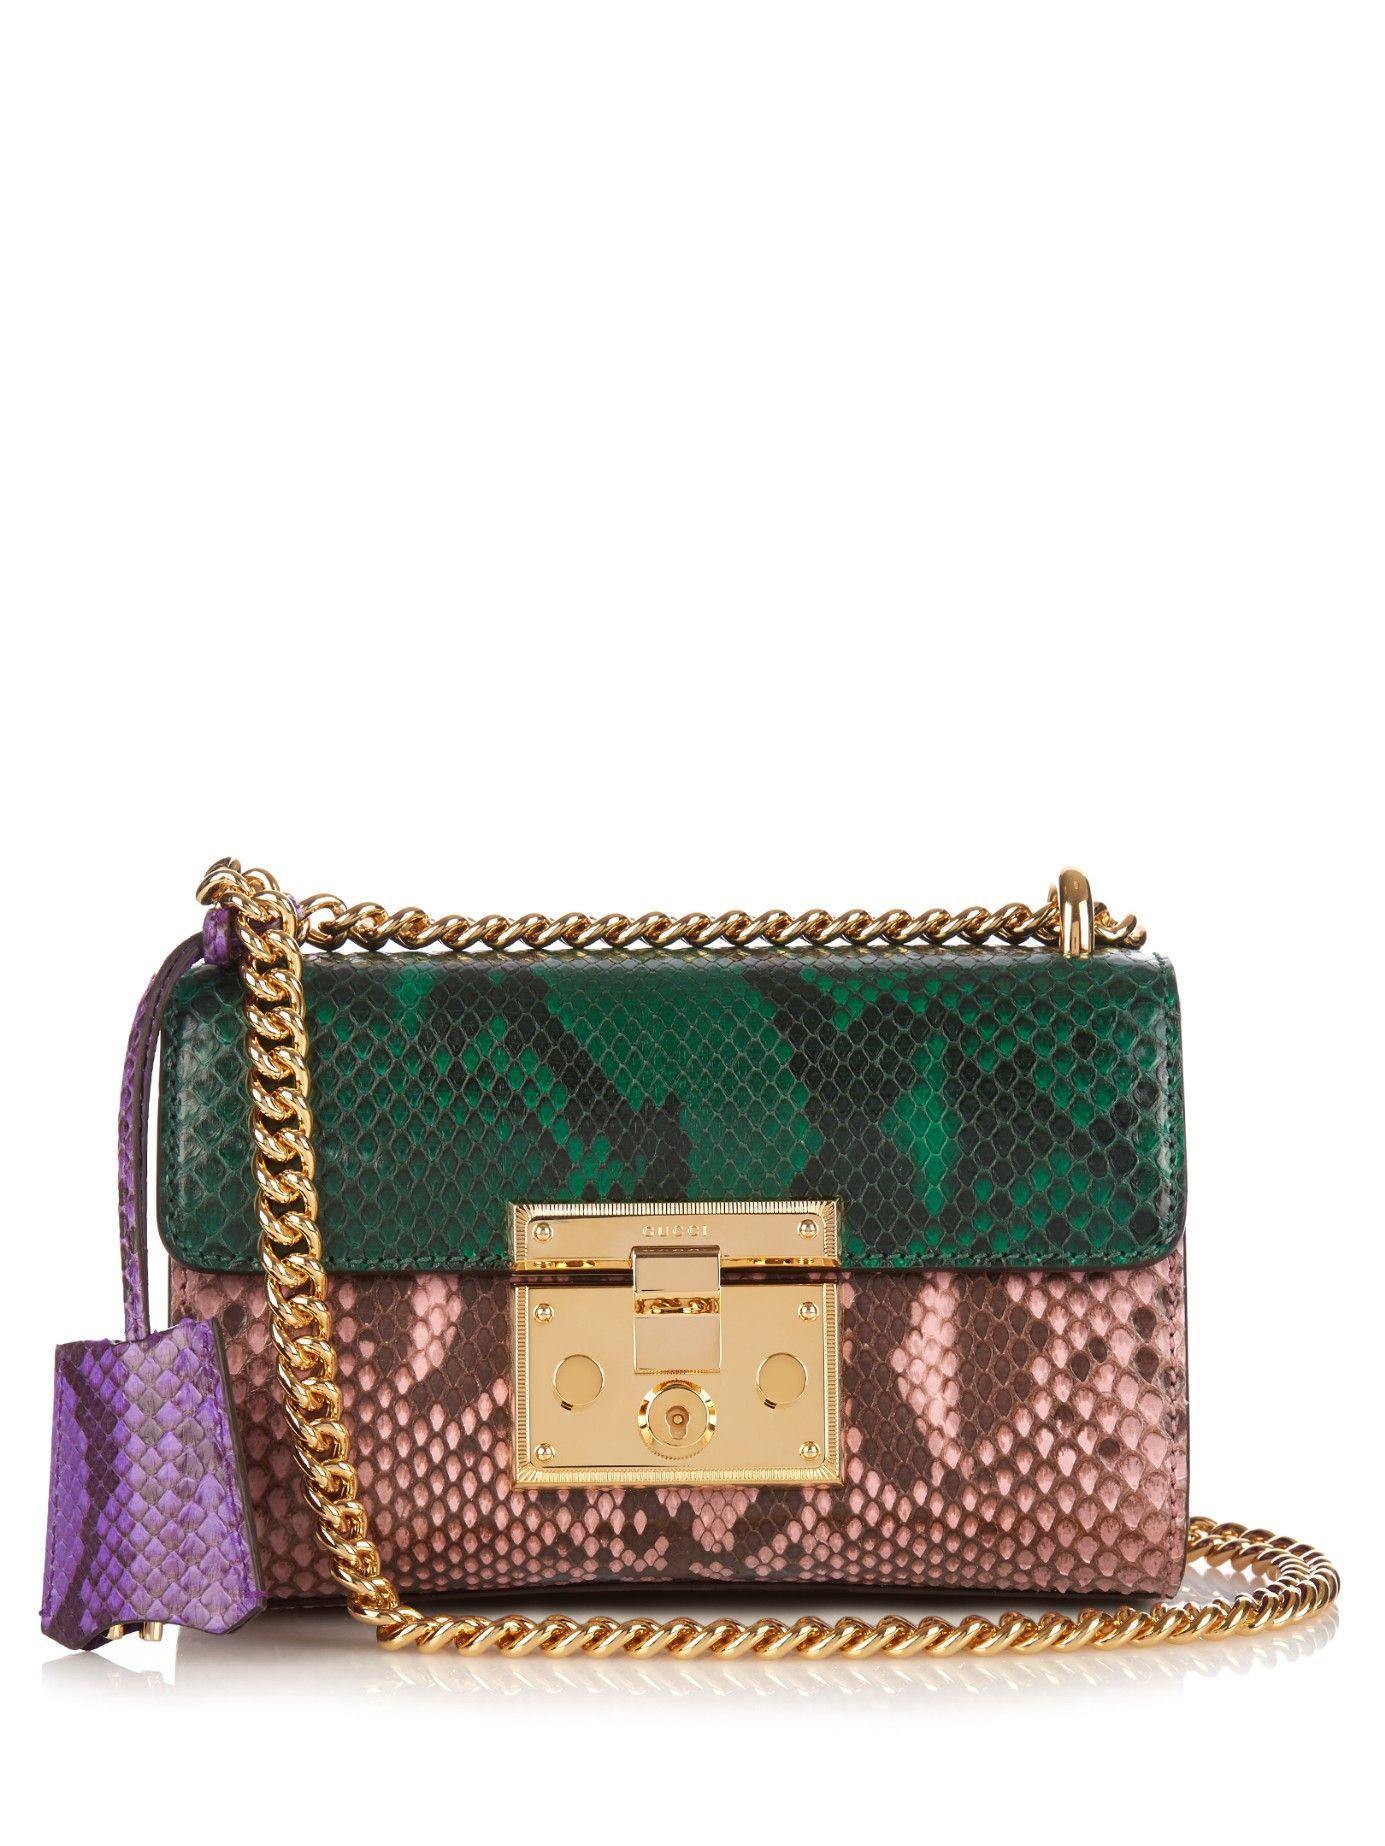 e55c342c0a Padlock python shoulder bag Gucci Womens Shoulder Bags